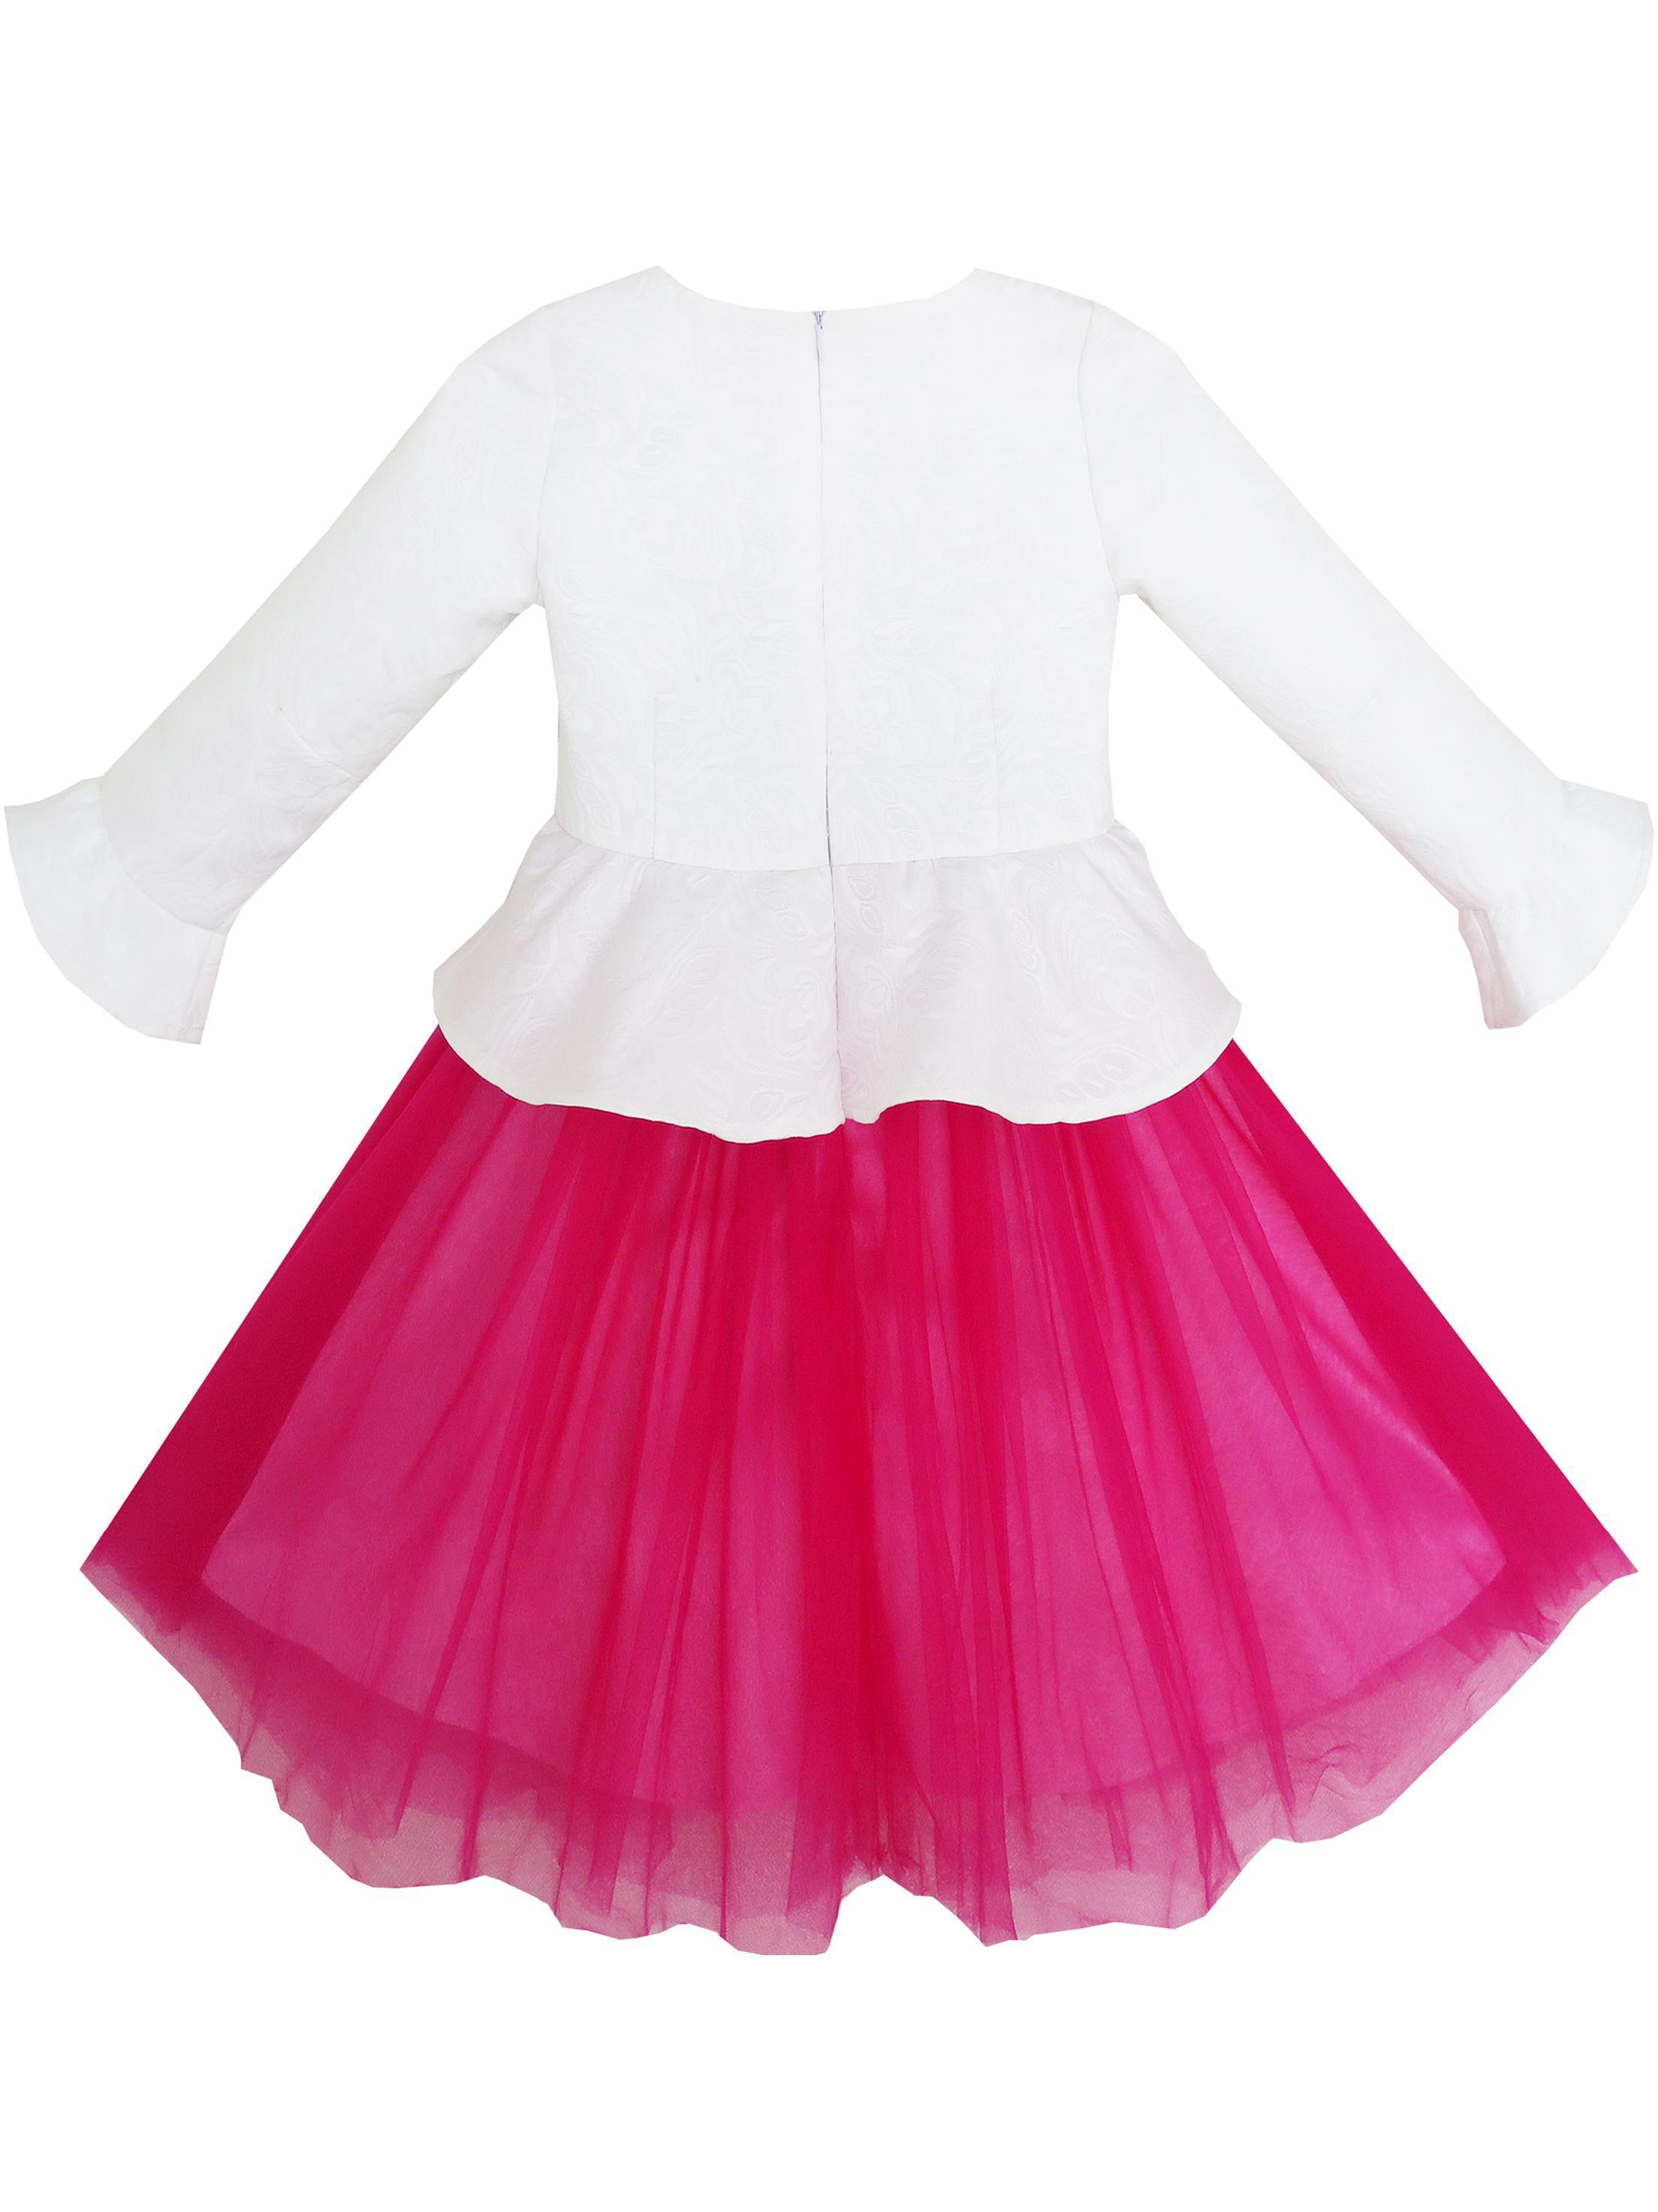 7771bfe997e9 Girls Dress 3 4 Sleeve Floral Flounced Skirt 2-in-1 Set Uniform ...